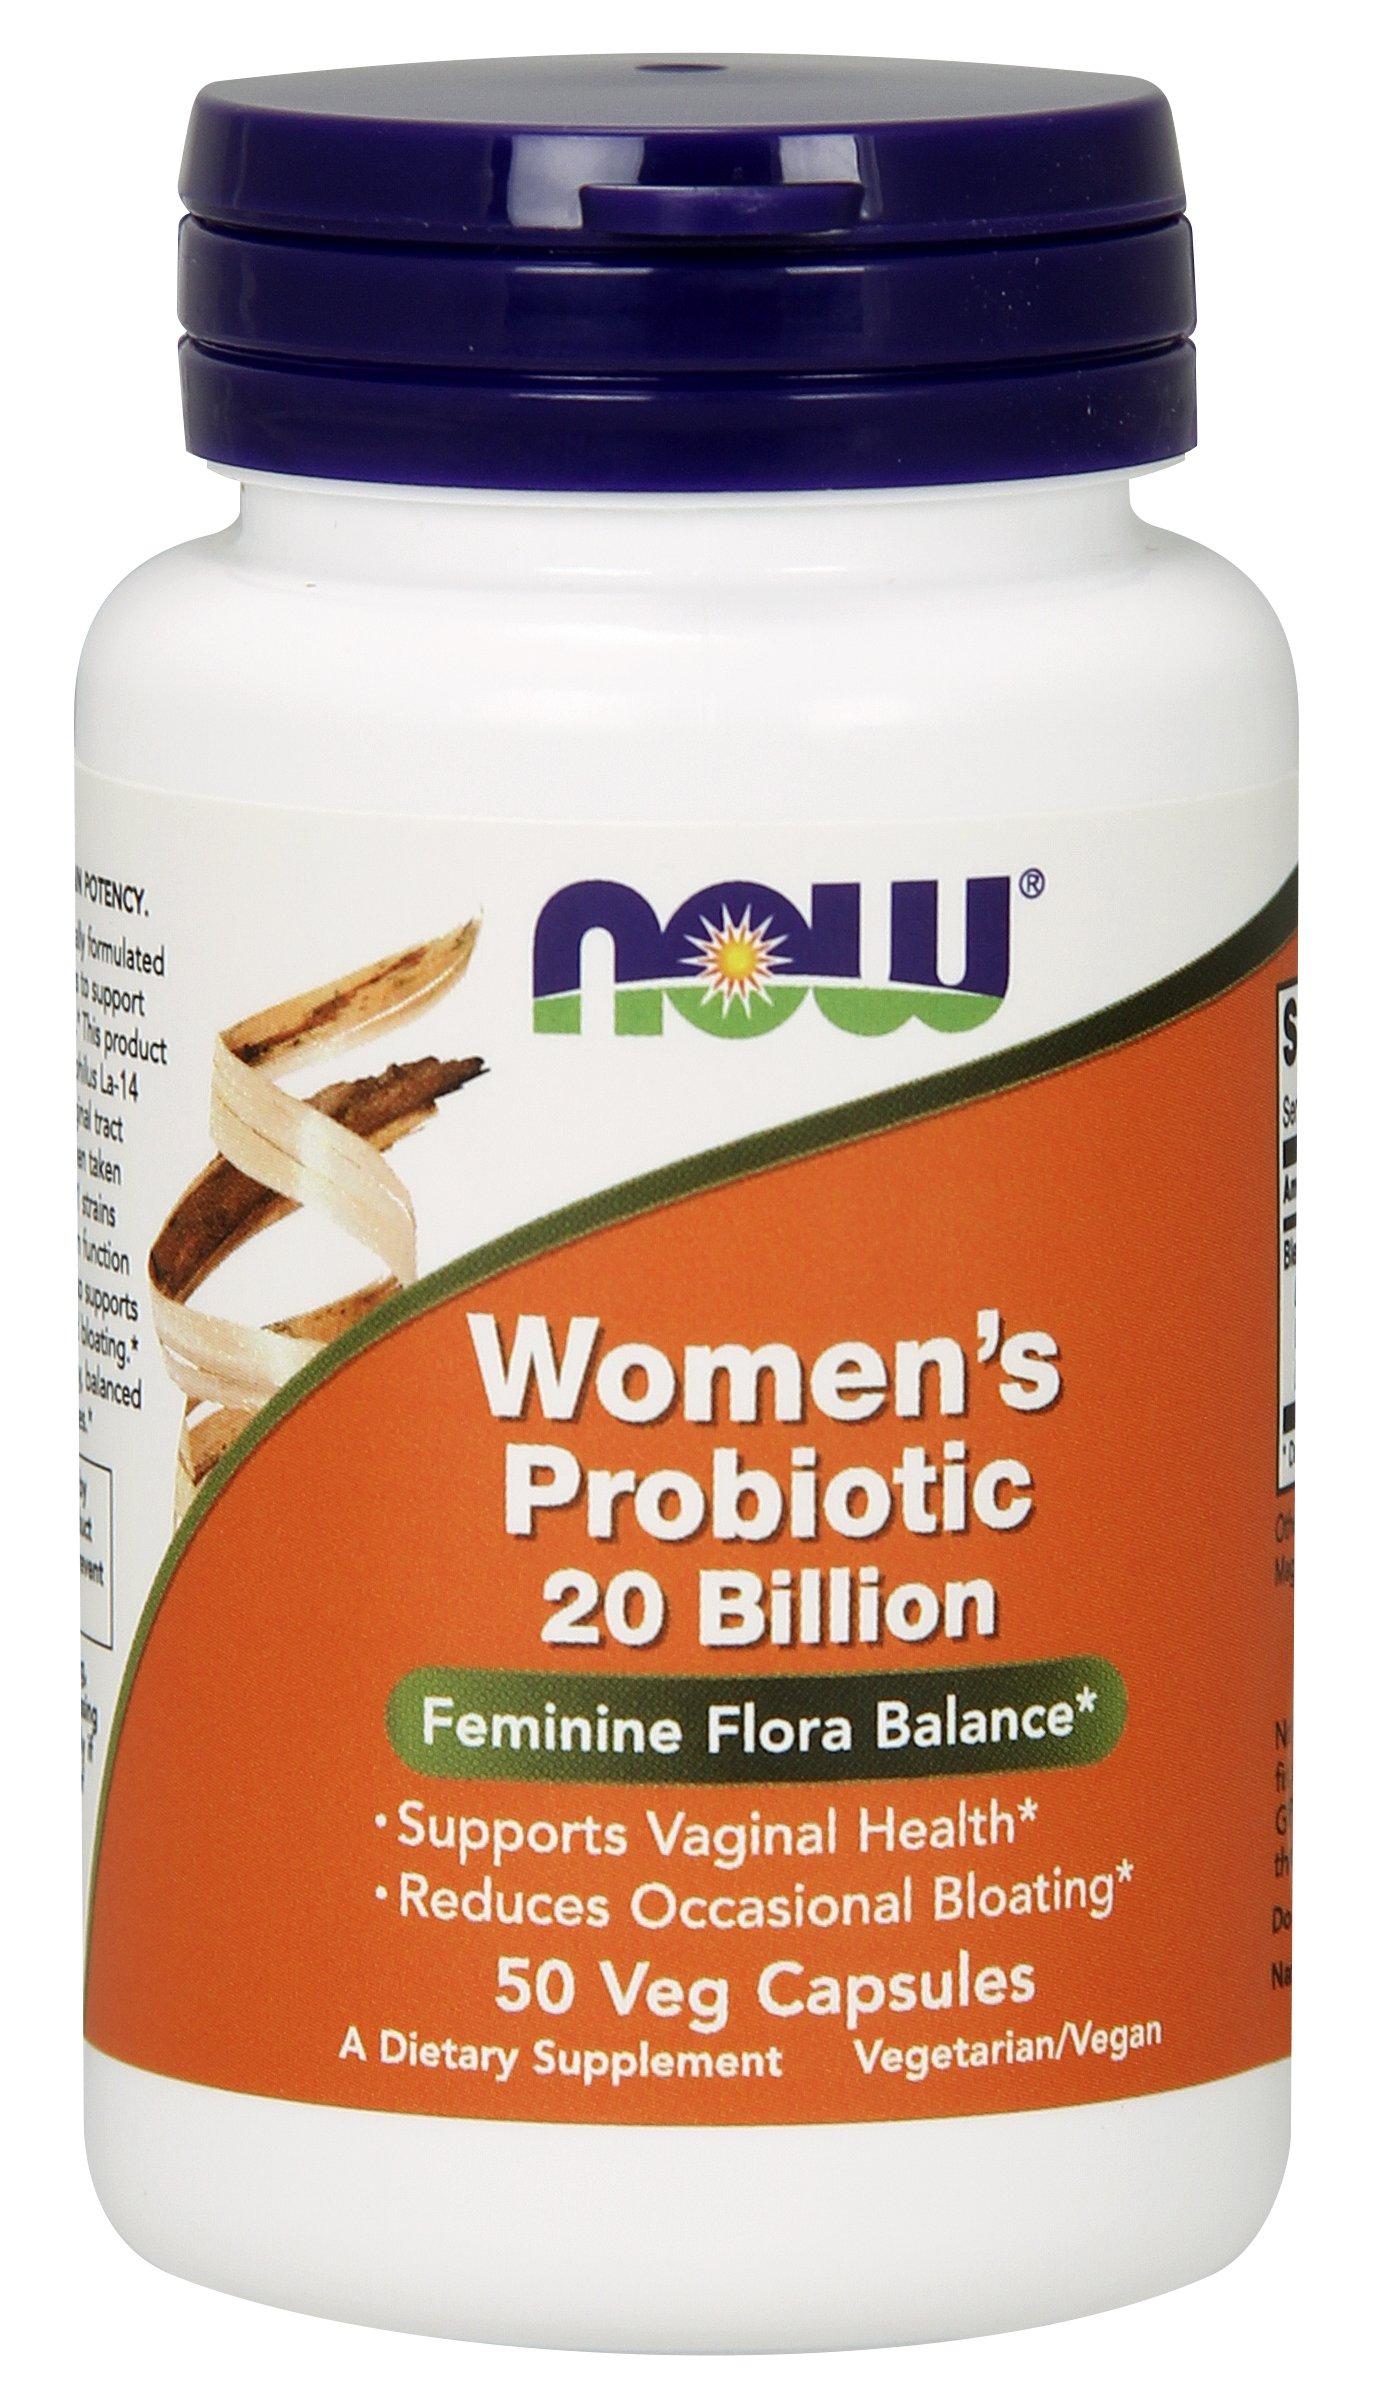 NOW Women's Probiotic 20 Billion, 50 Veg Capsules